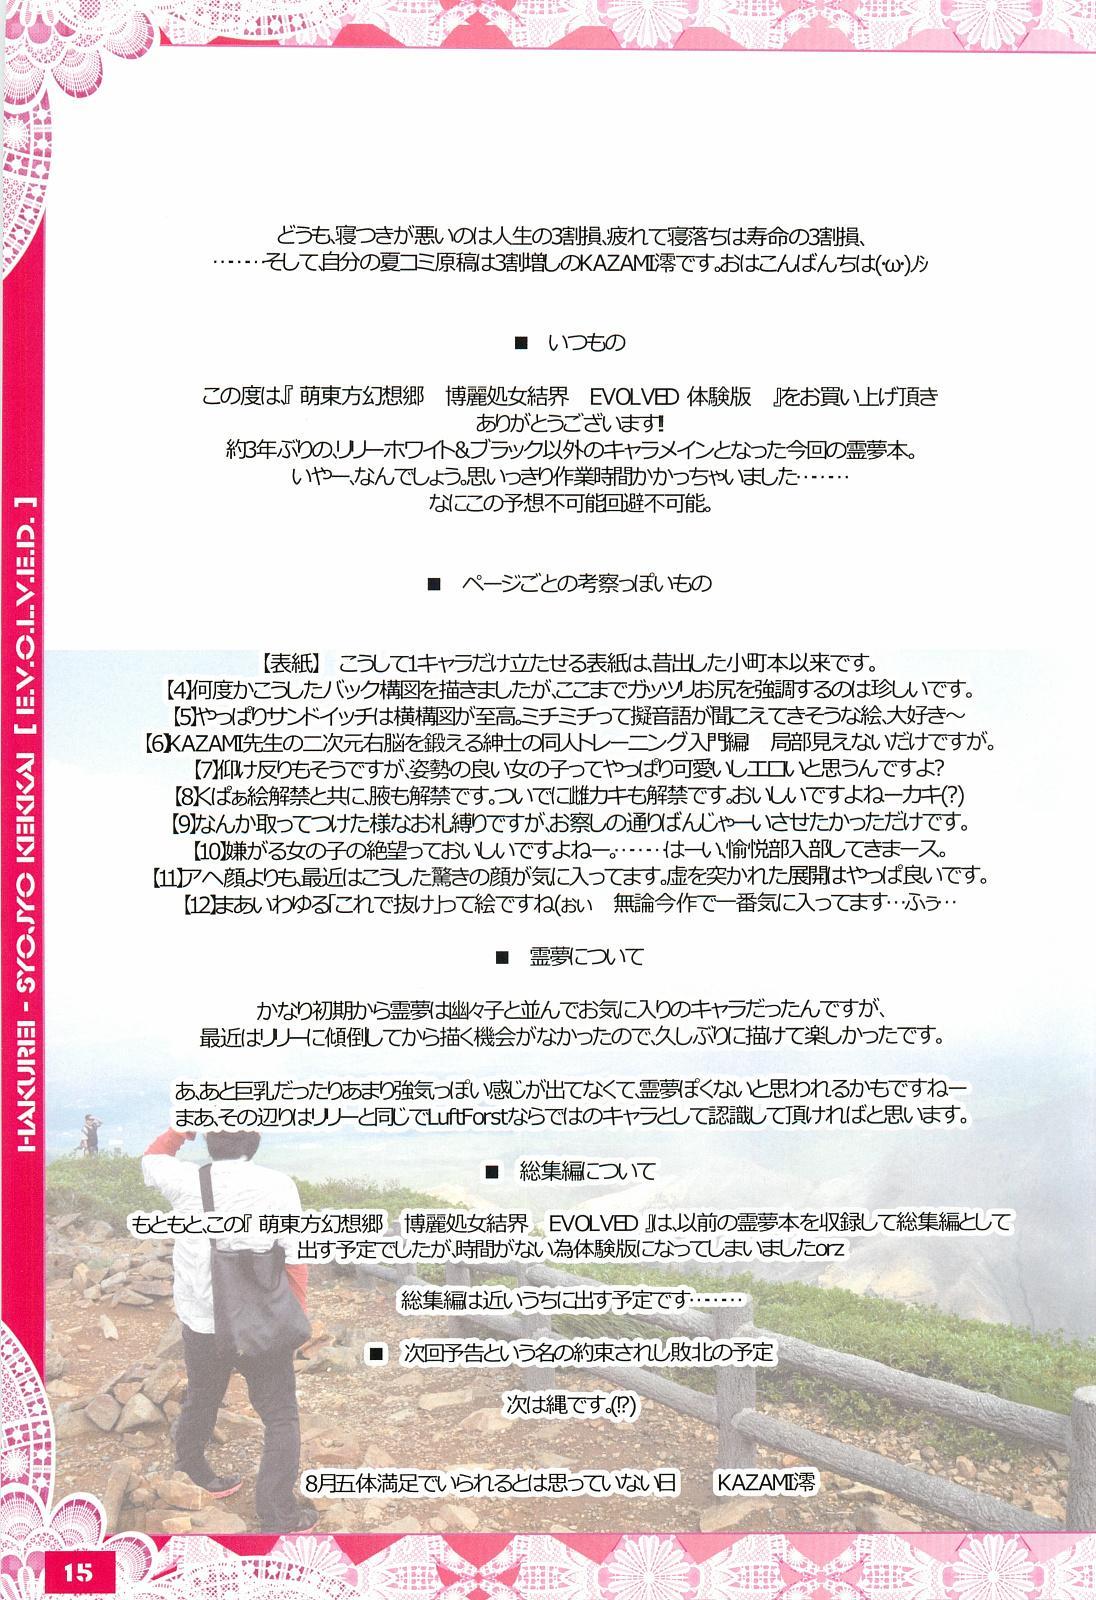 Moe Touhou Gensoukyou - Hakurei Shojo Kekkai EVOLVED Taikenban 13